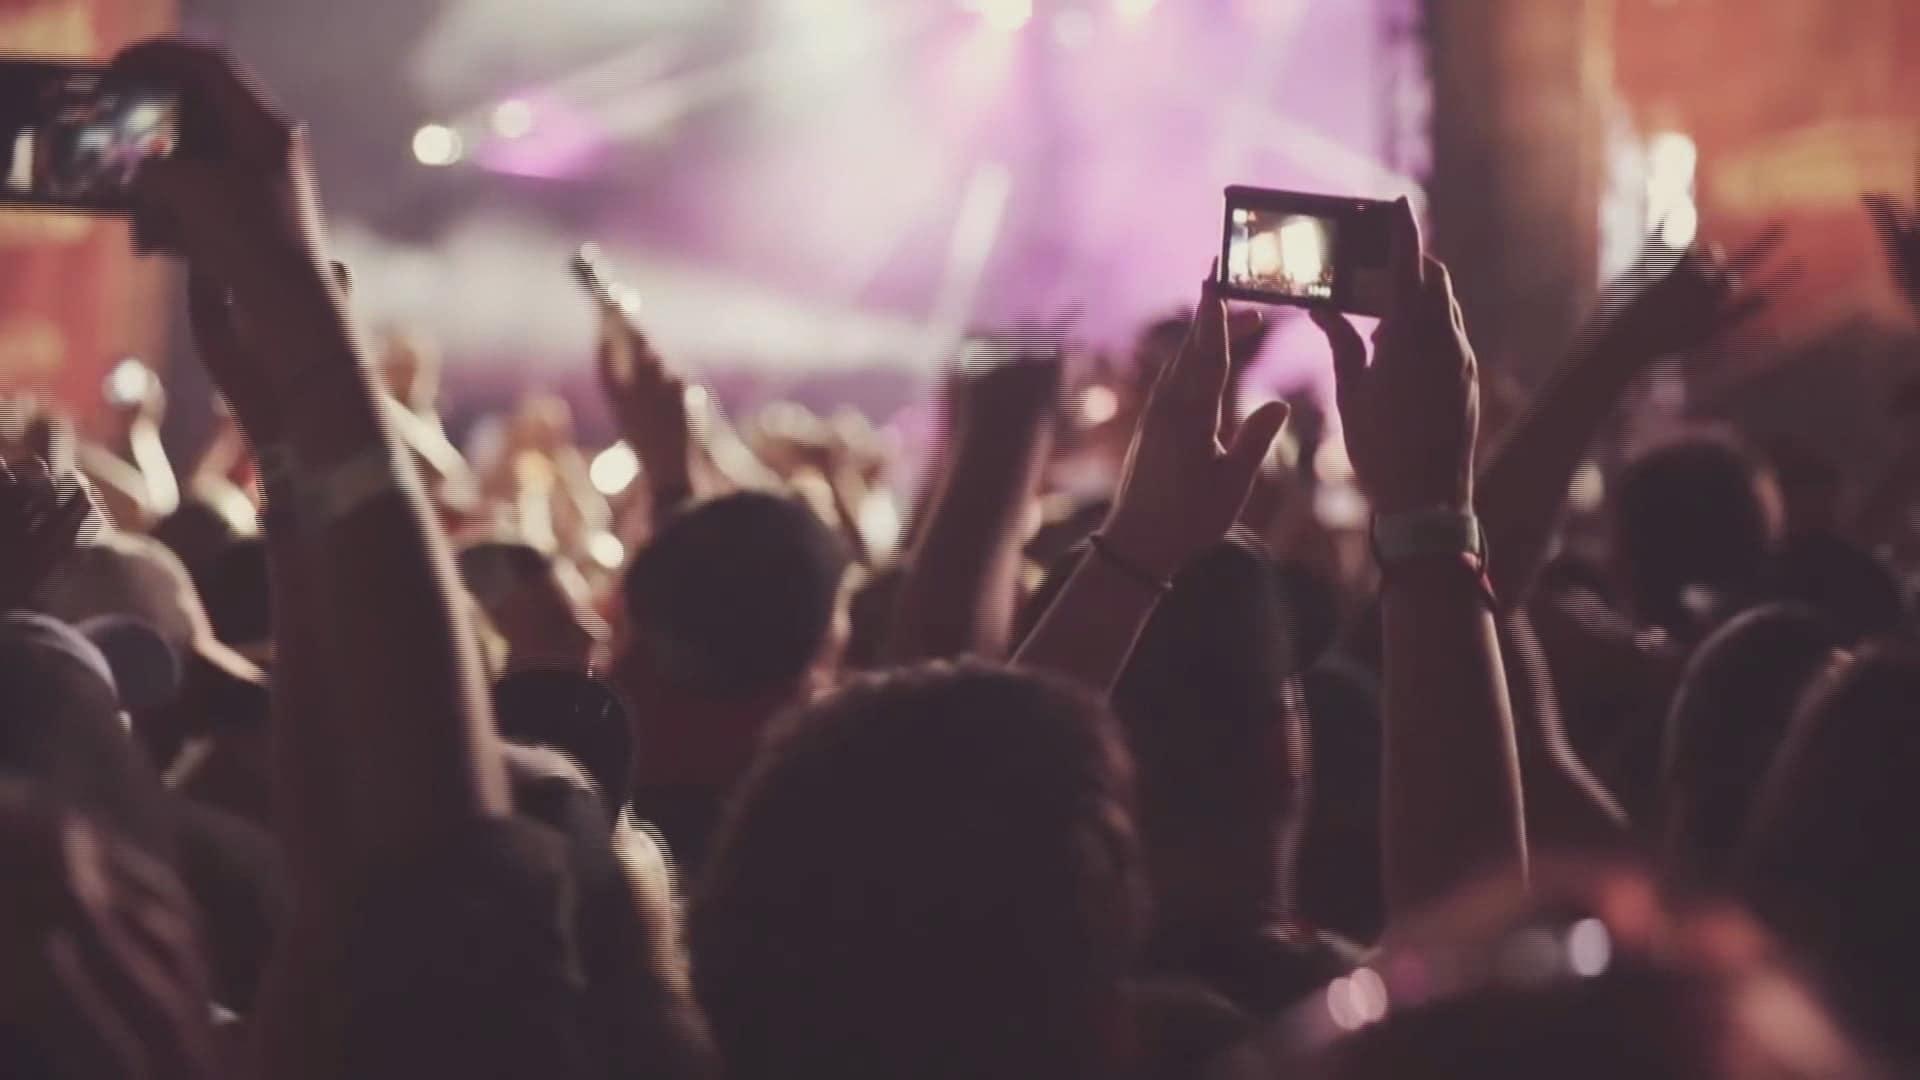 The National - Music festival frenzy